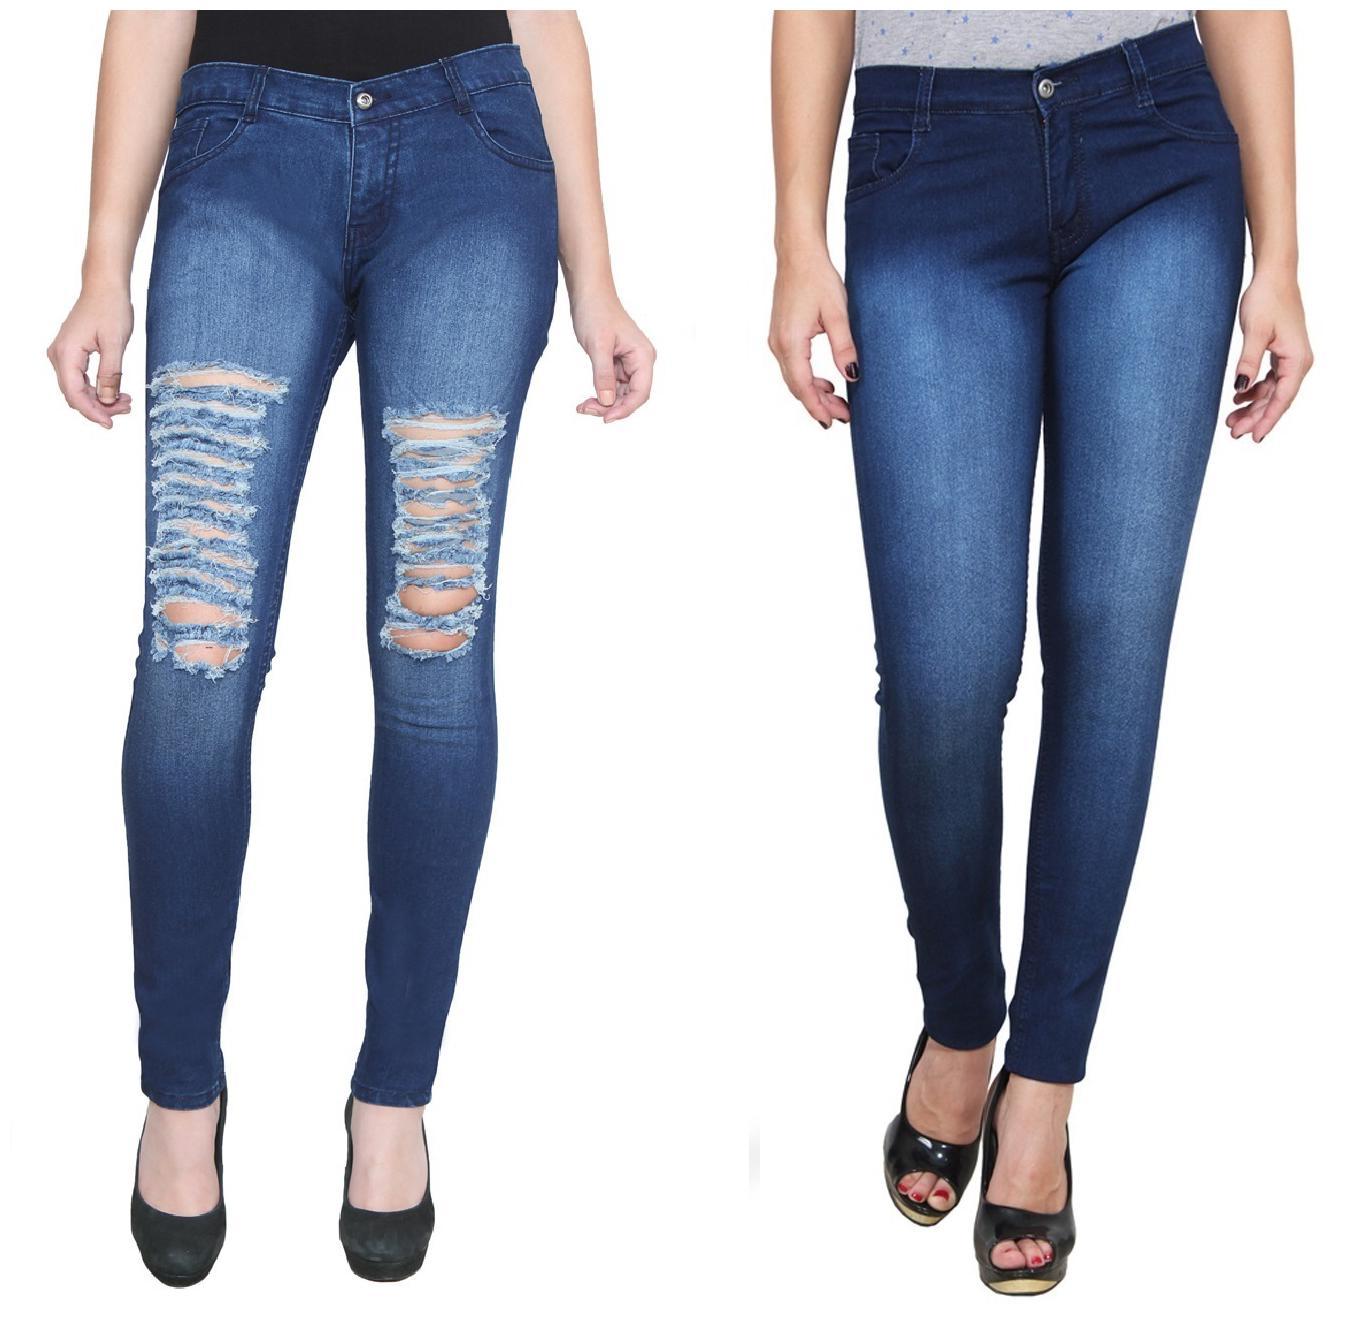 Ansh Fashion Wear Women's Denim Jeans - Regular Fit - Pack of 2 - T5DB-DBM